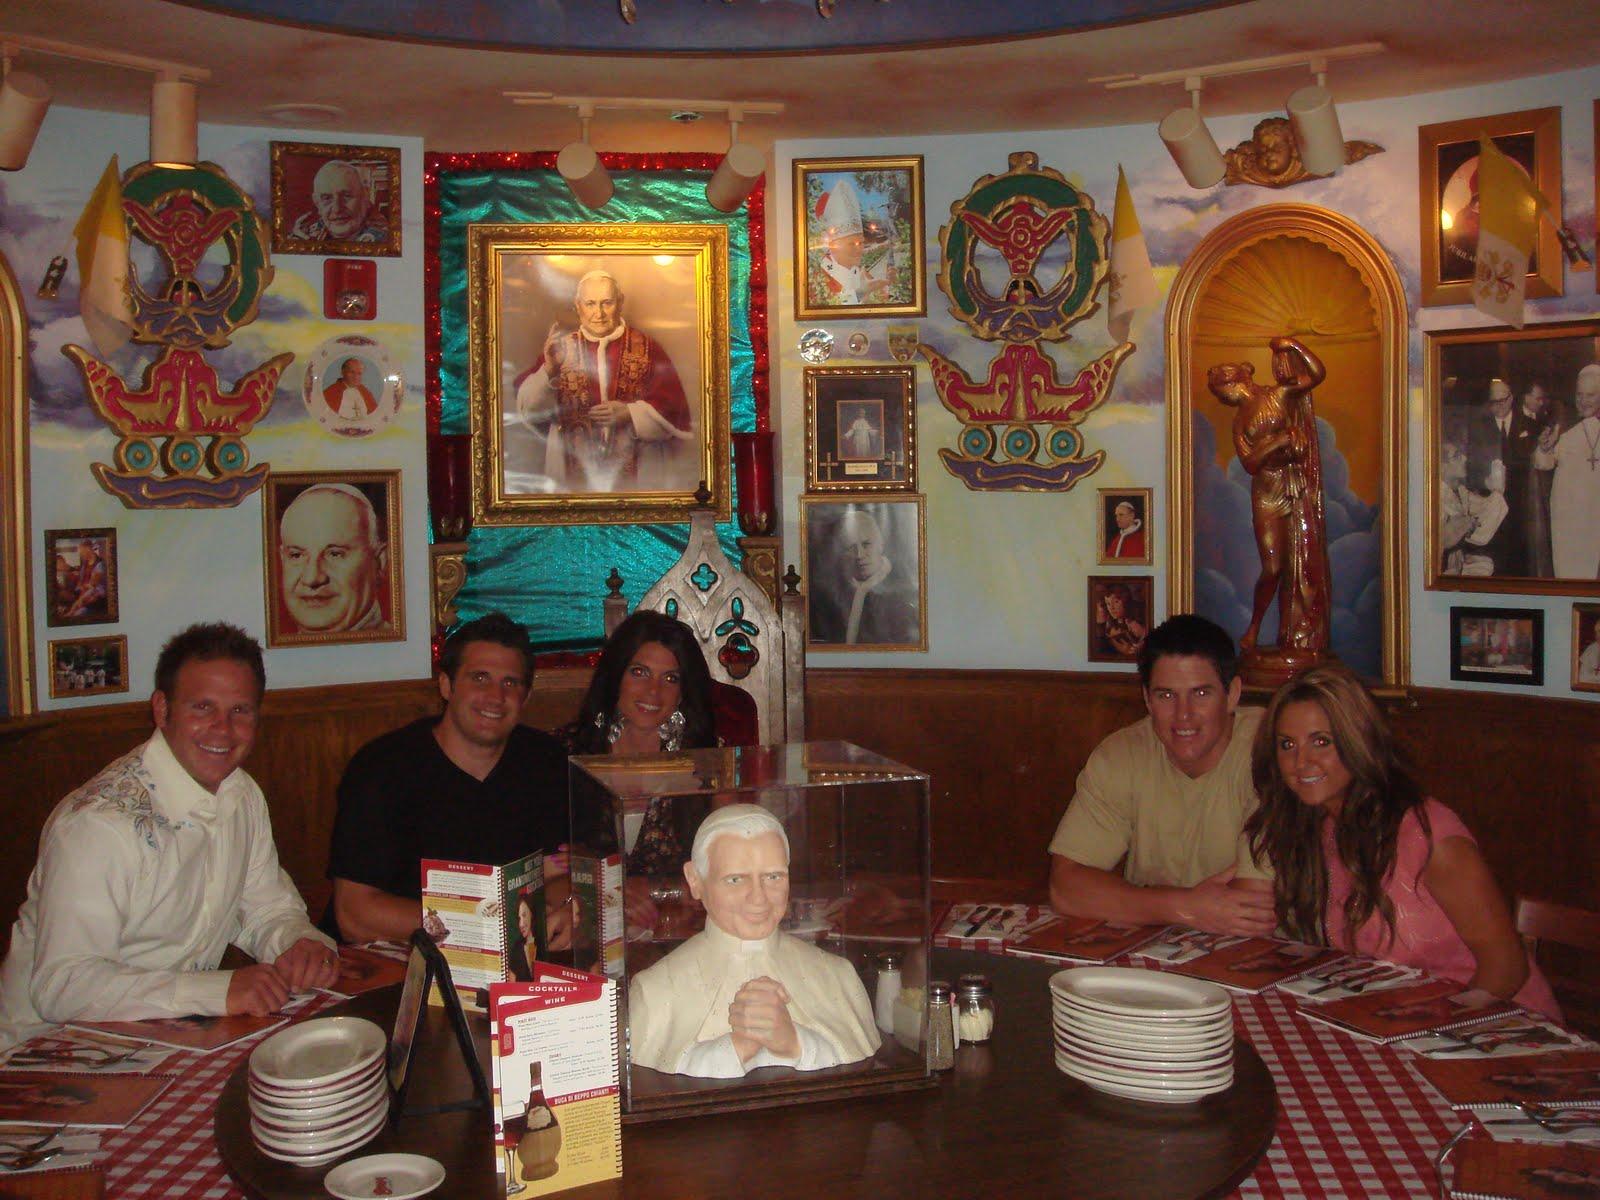 100 buca di beppo pope table italian restaurant interior stock photos u0026 italian restaurant - Buca di beppo pope table ...